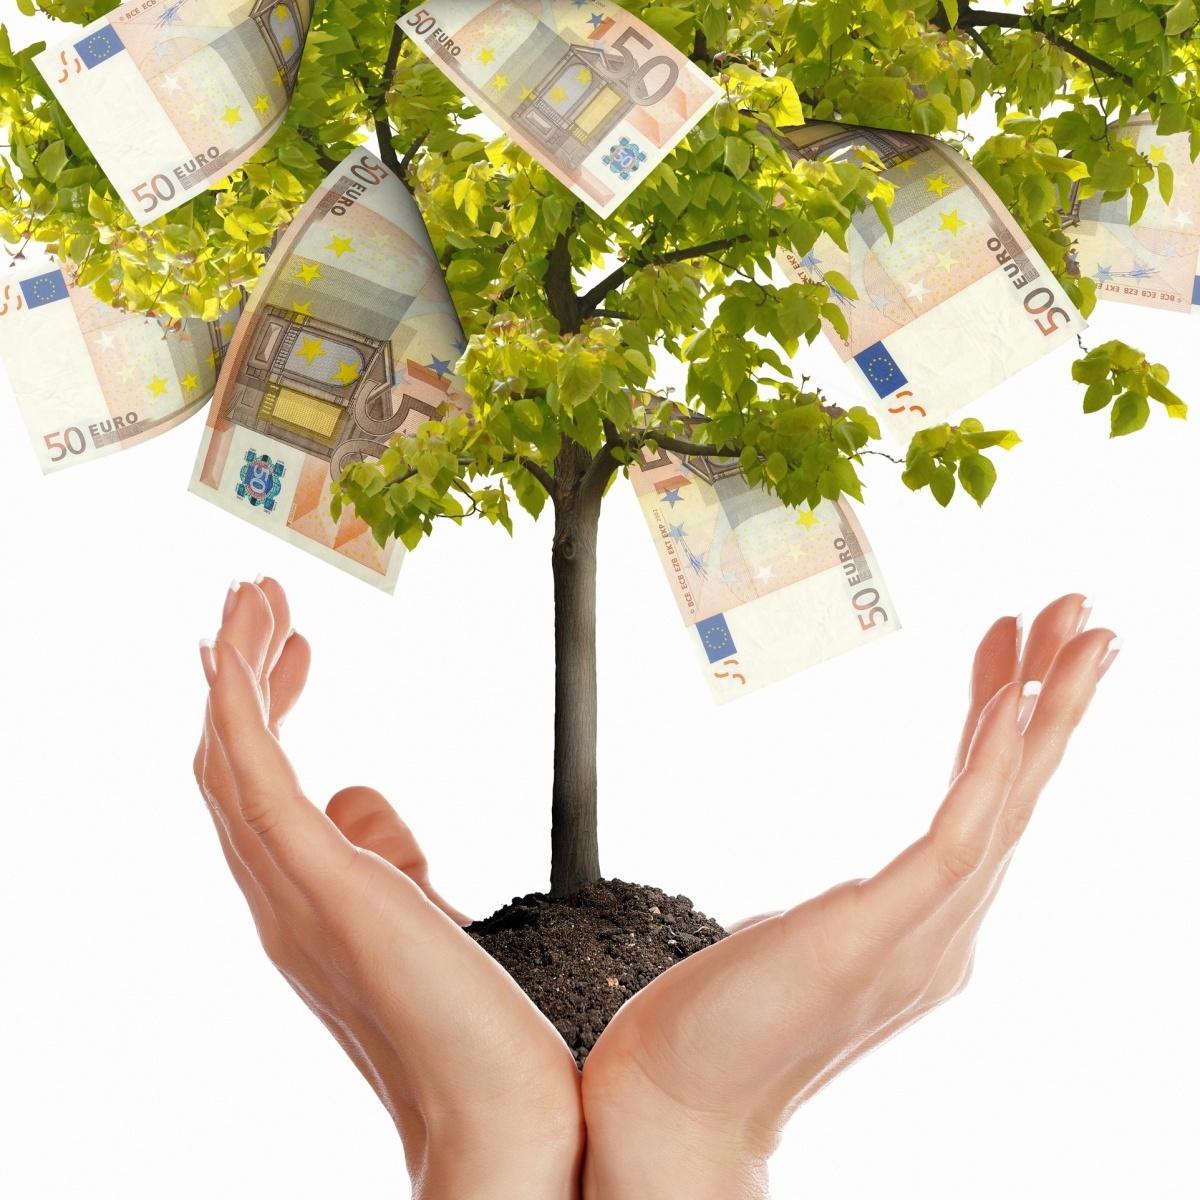 Дерево в ладонях с евро на листочках.